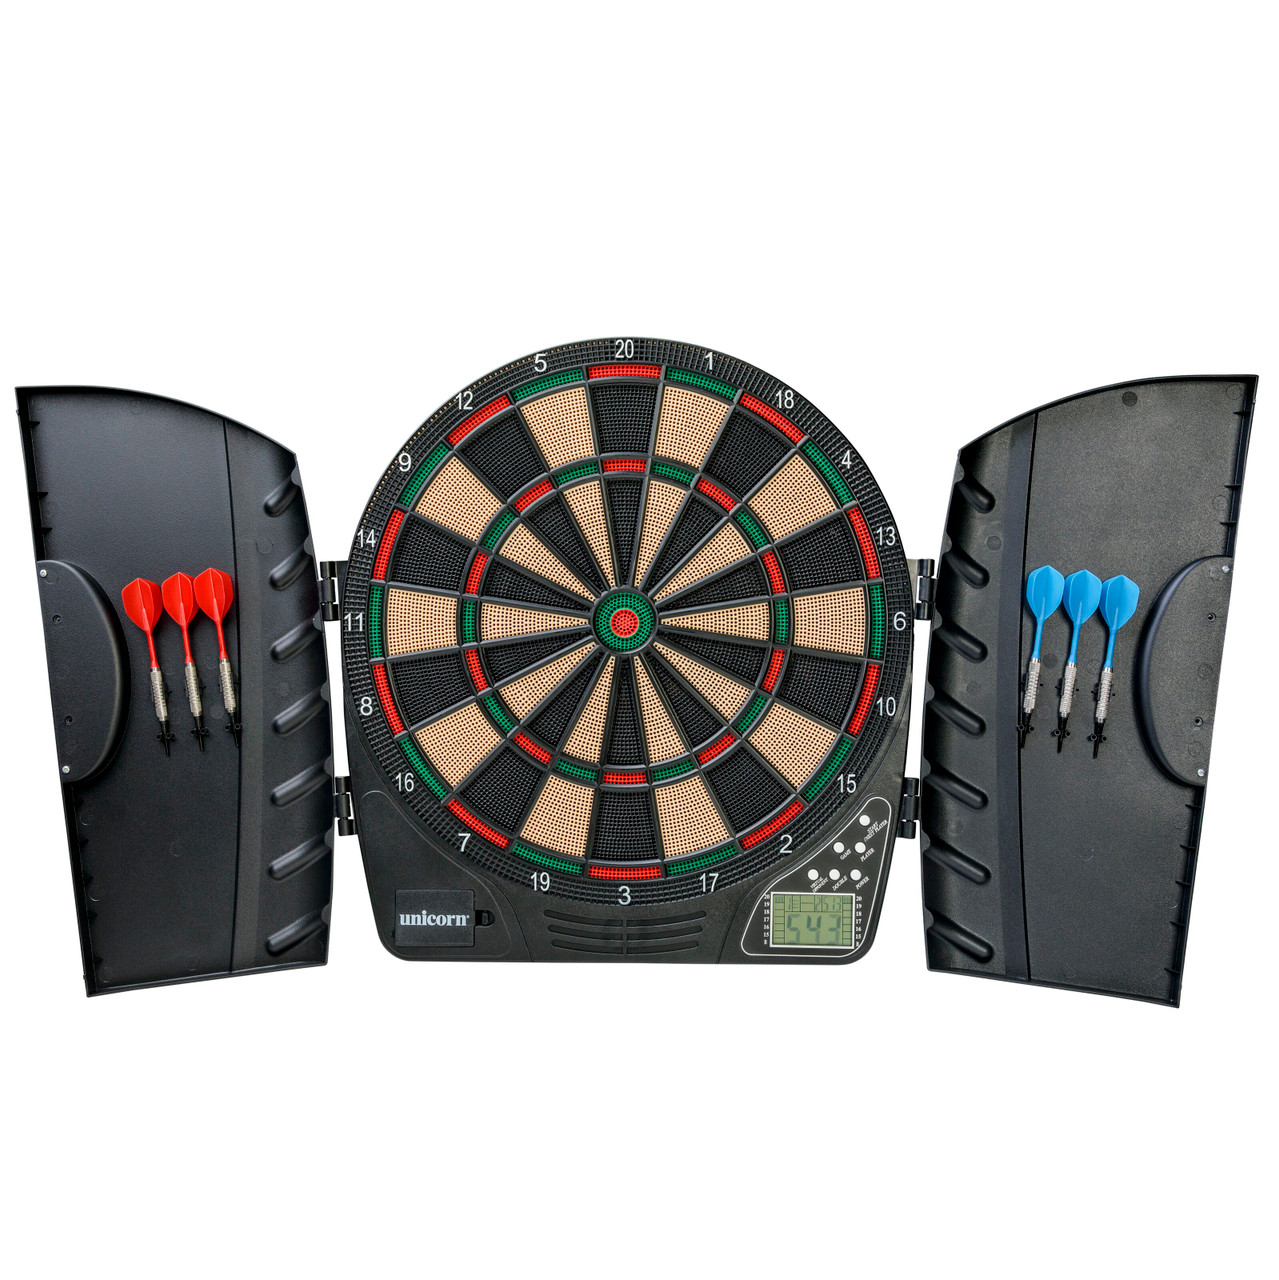 D77025, Unicorn, Vector, Electronic, Dartboard, FREE SHIPPING